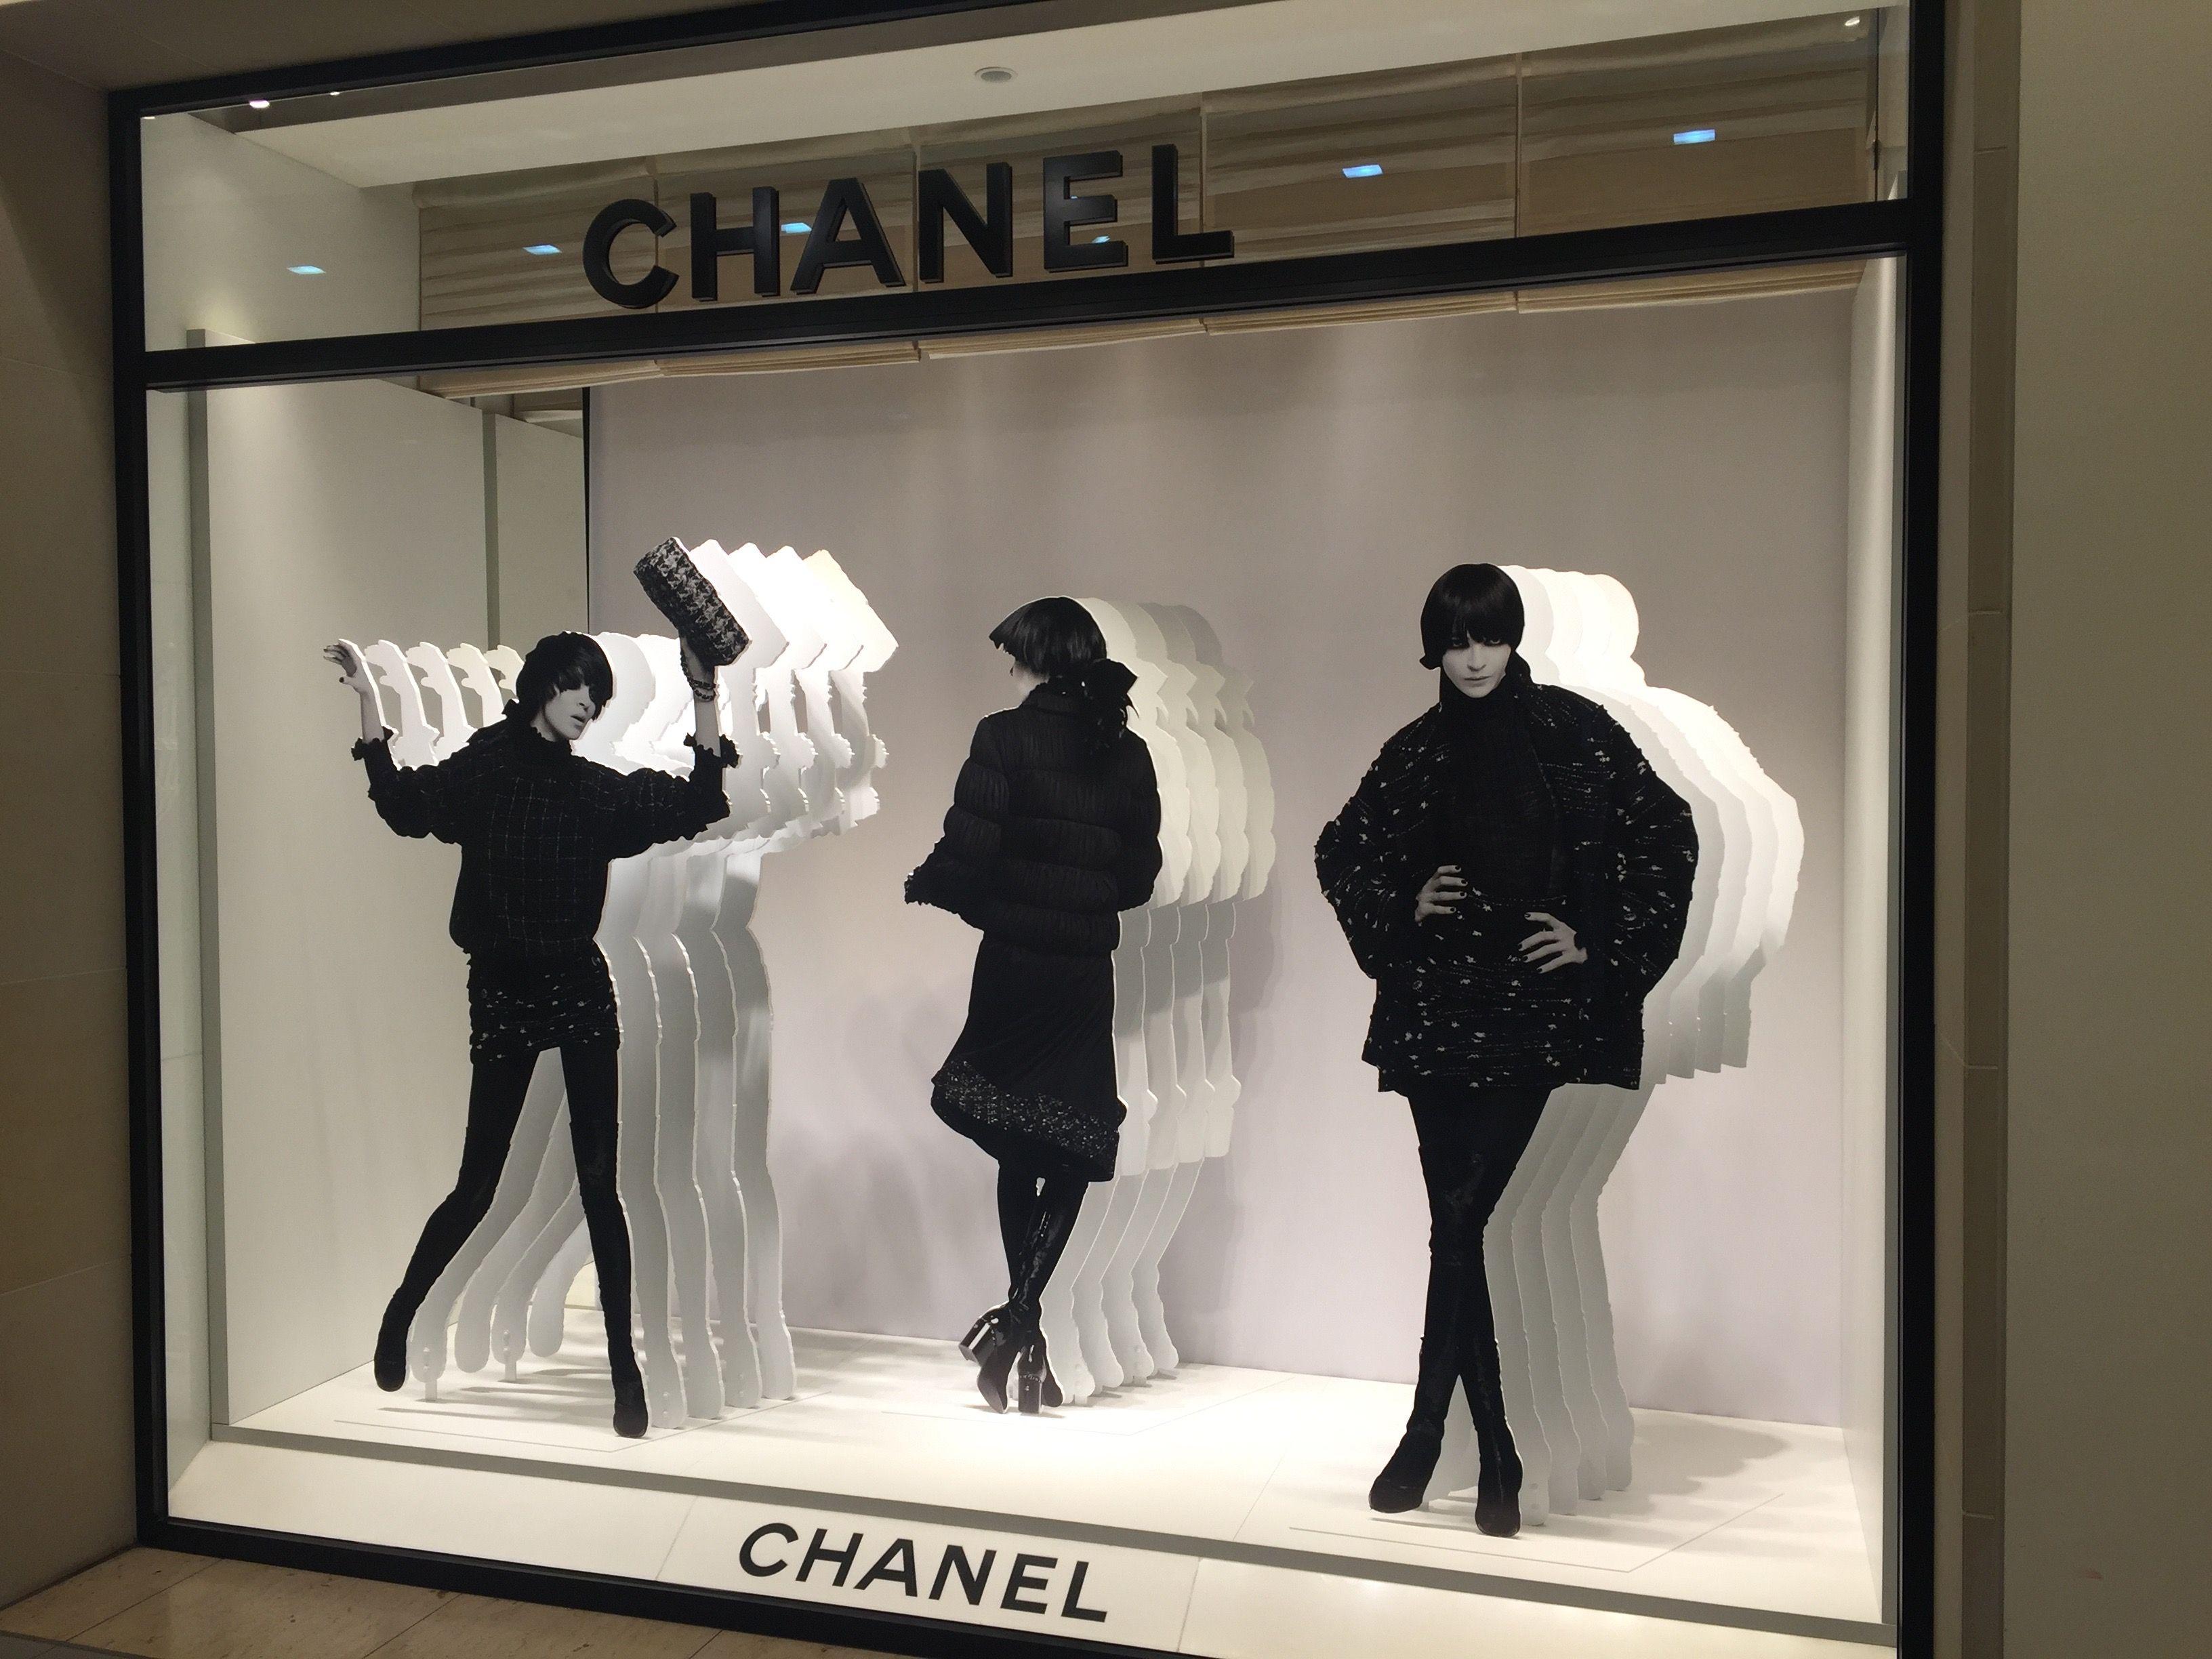 Chanel Berlin chanel at kadewe berlin great movement from layers window